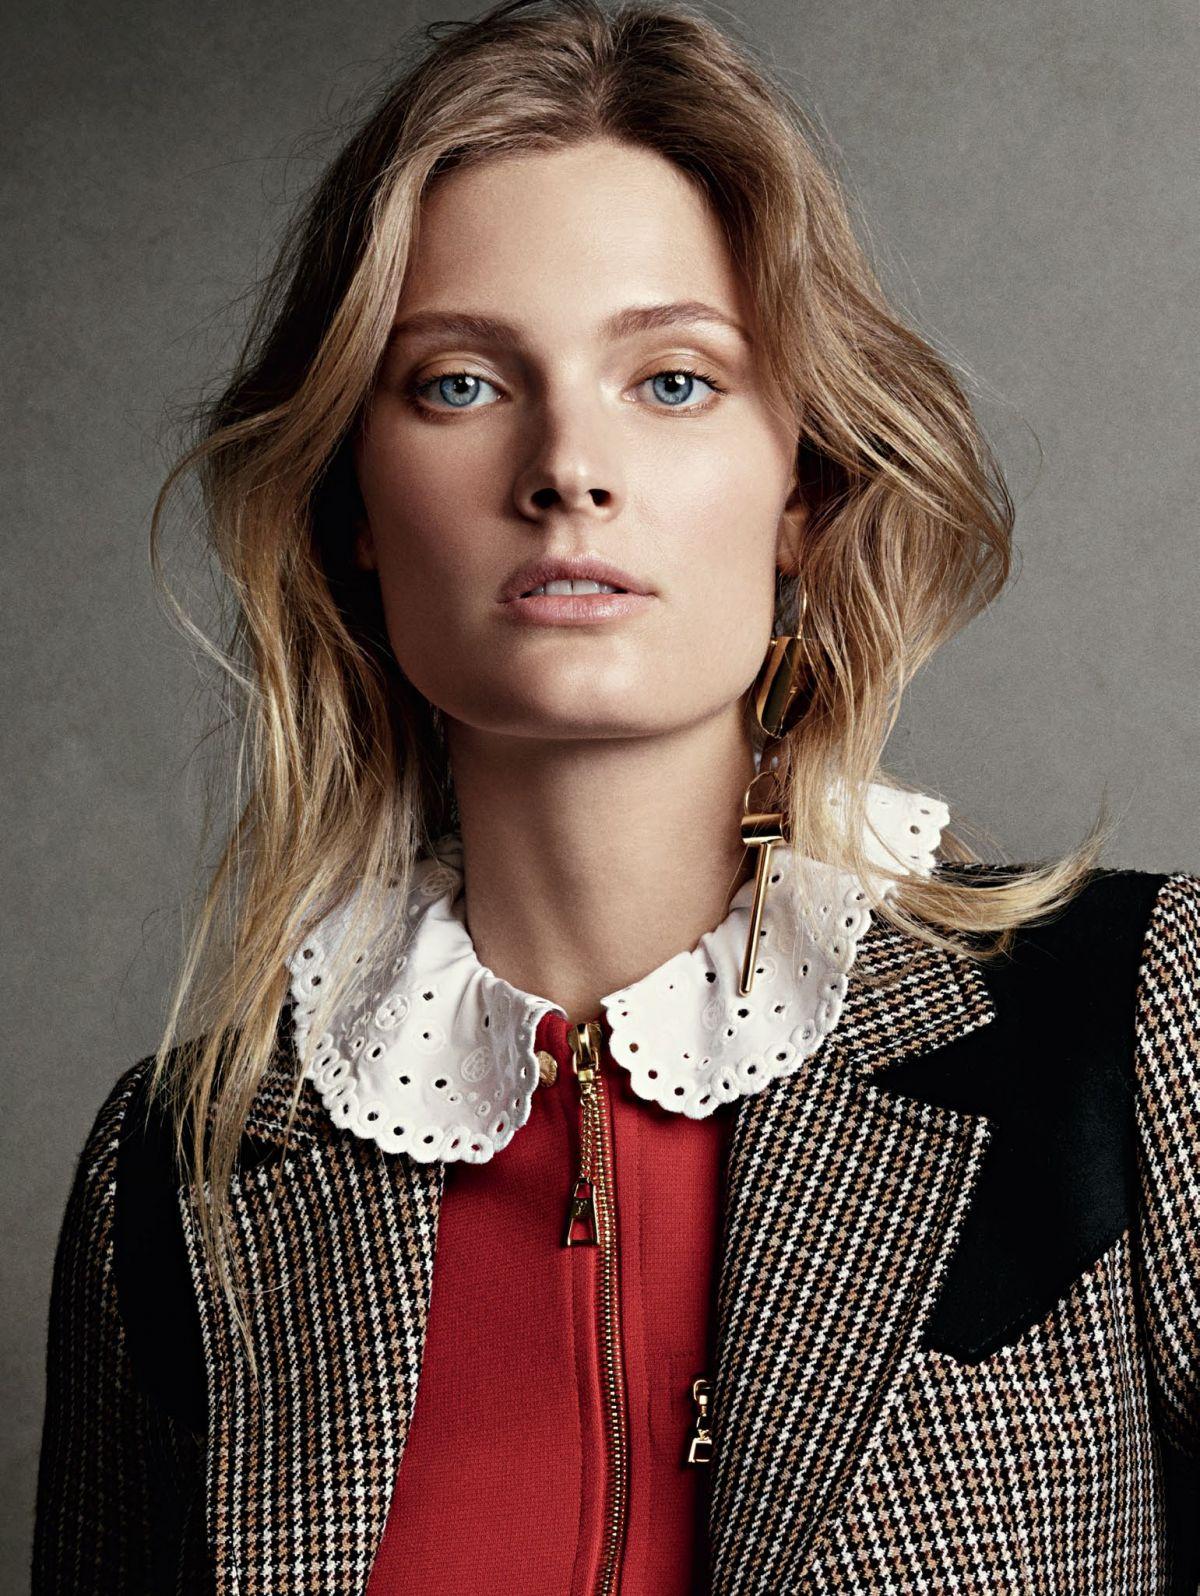 CONSTANCE JABLONSKI - Christian Macdonald Photoshoot for Vogue Australia